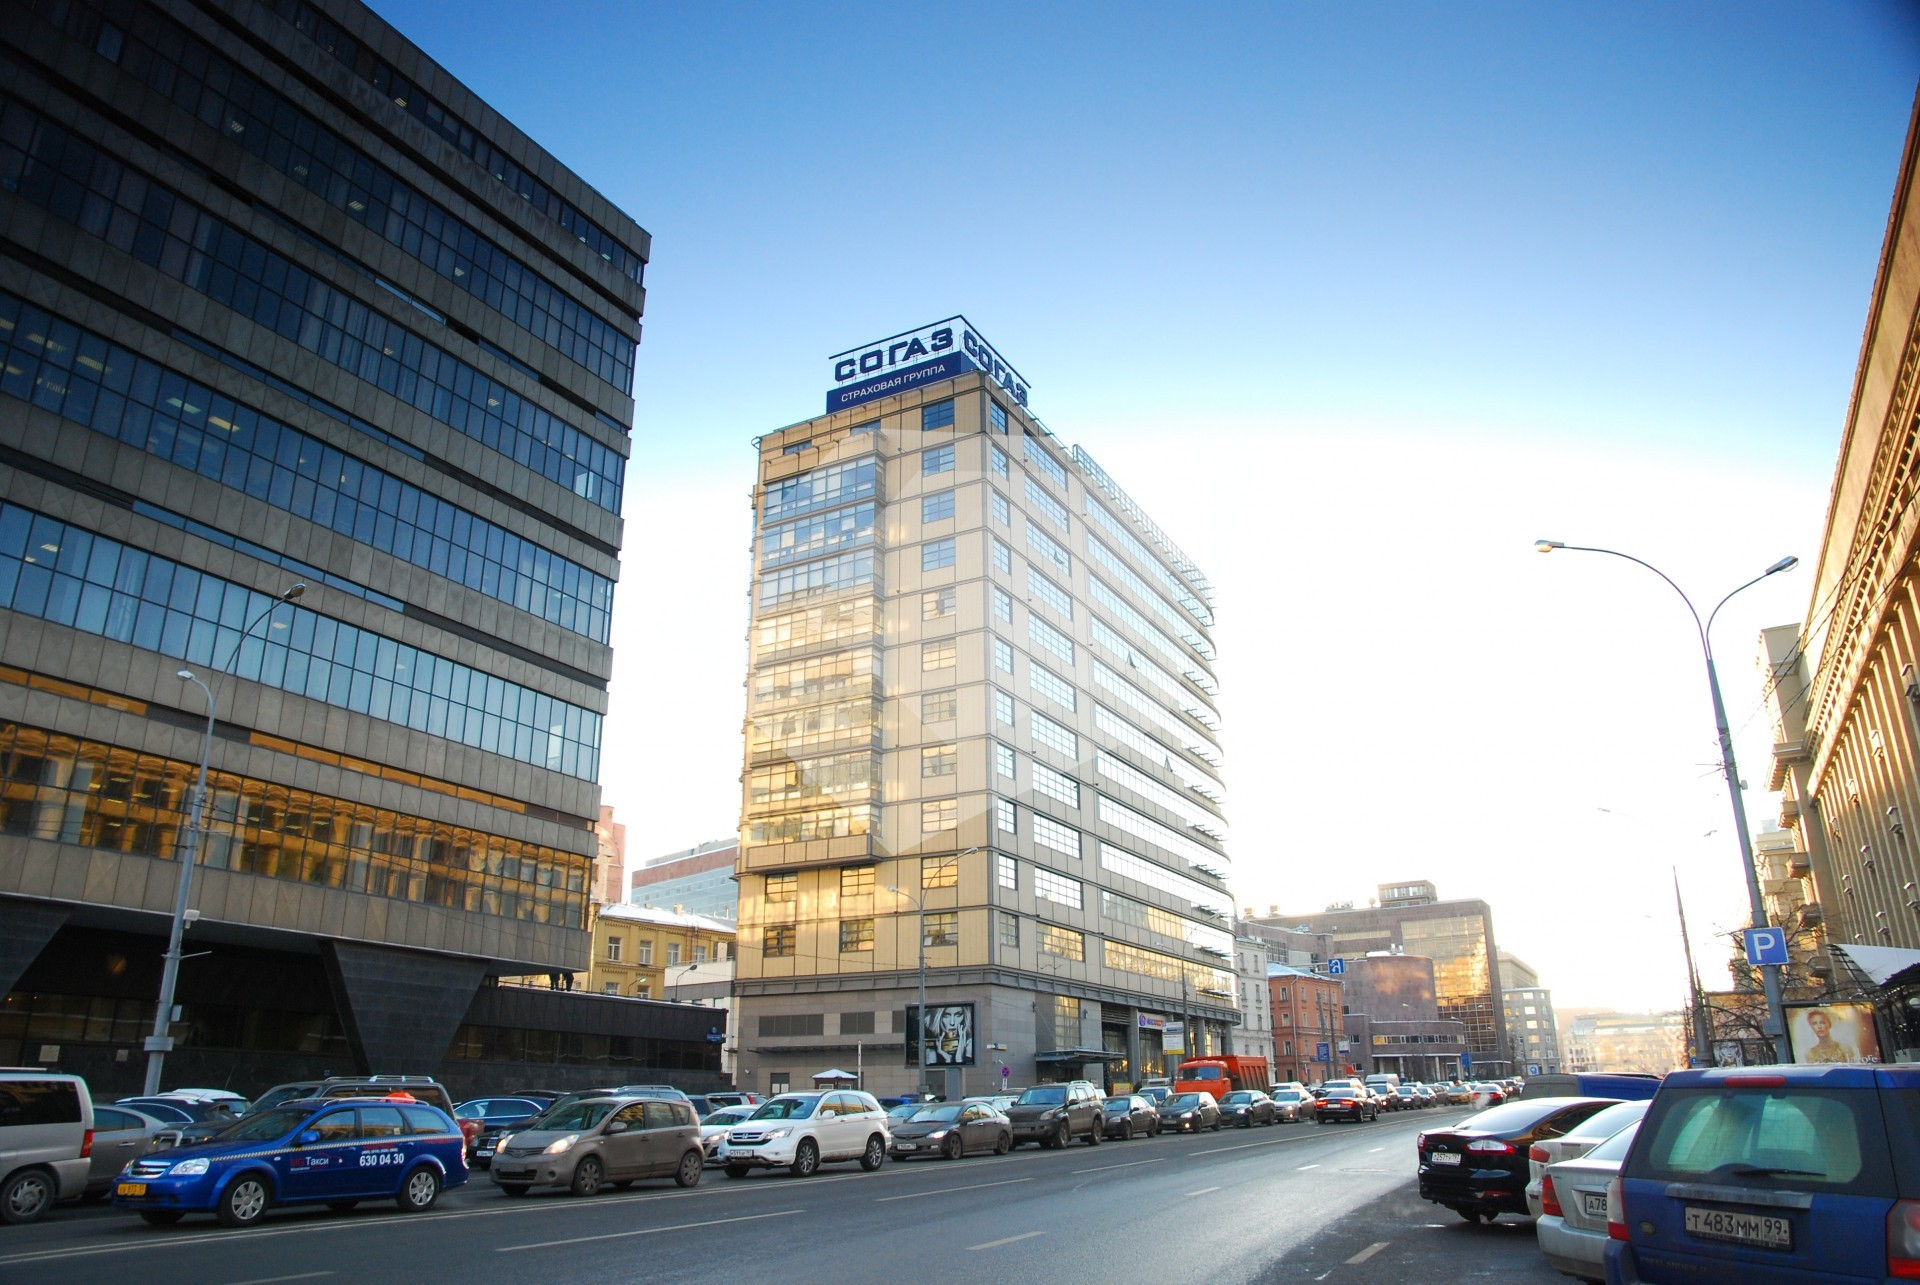 Аренда офиса проспект сахарова аренда офисов кривой рог карла маркса 10 - 20 к.в